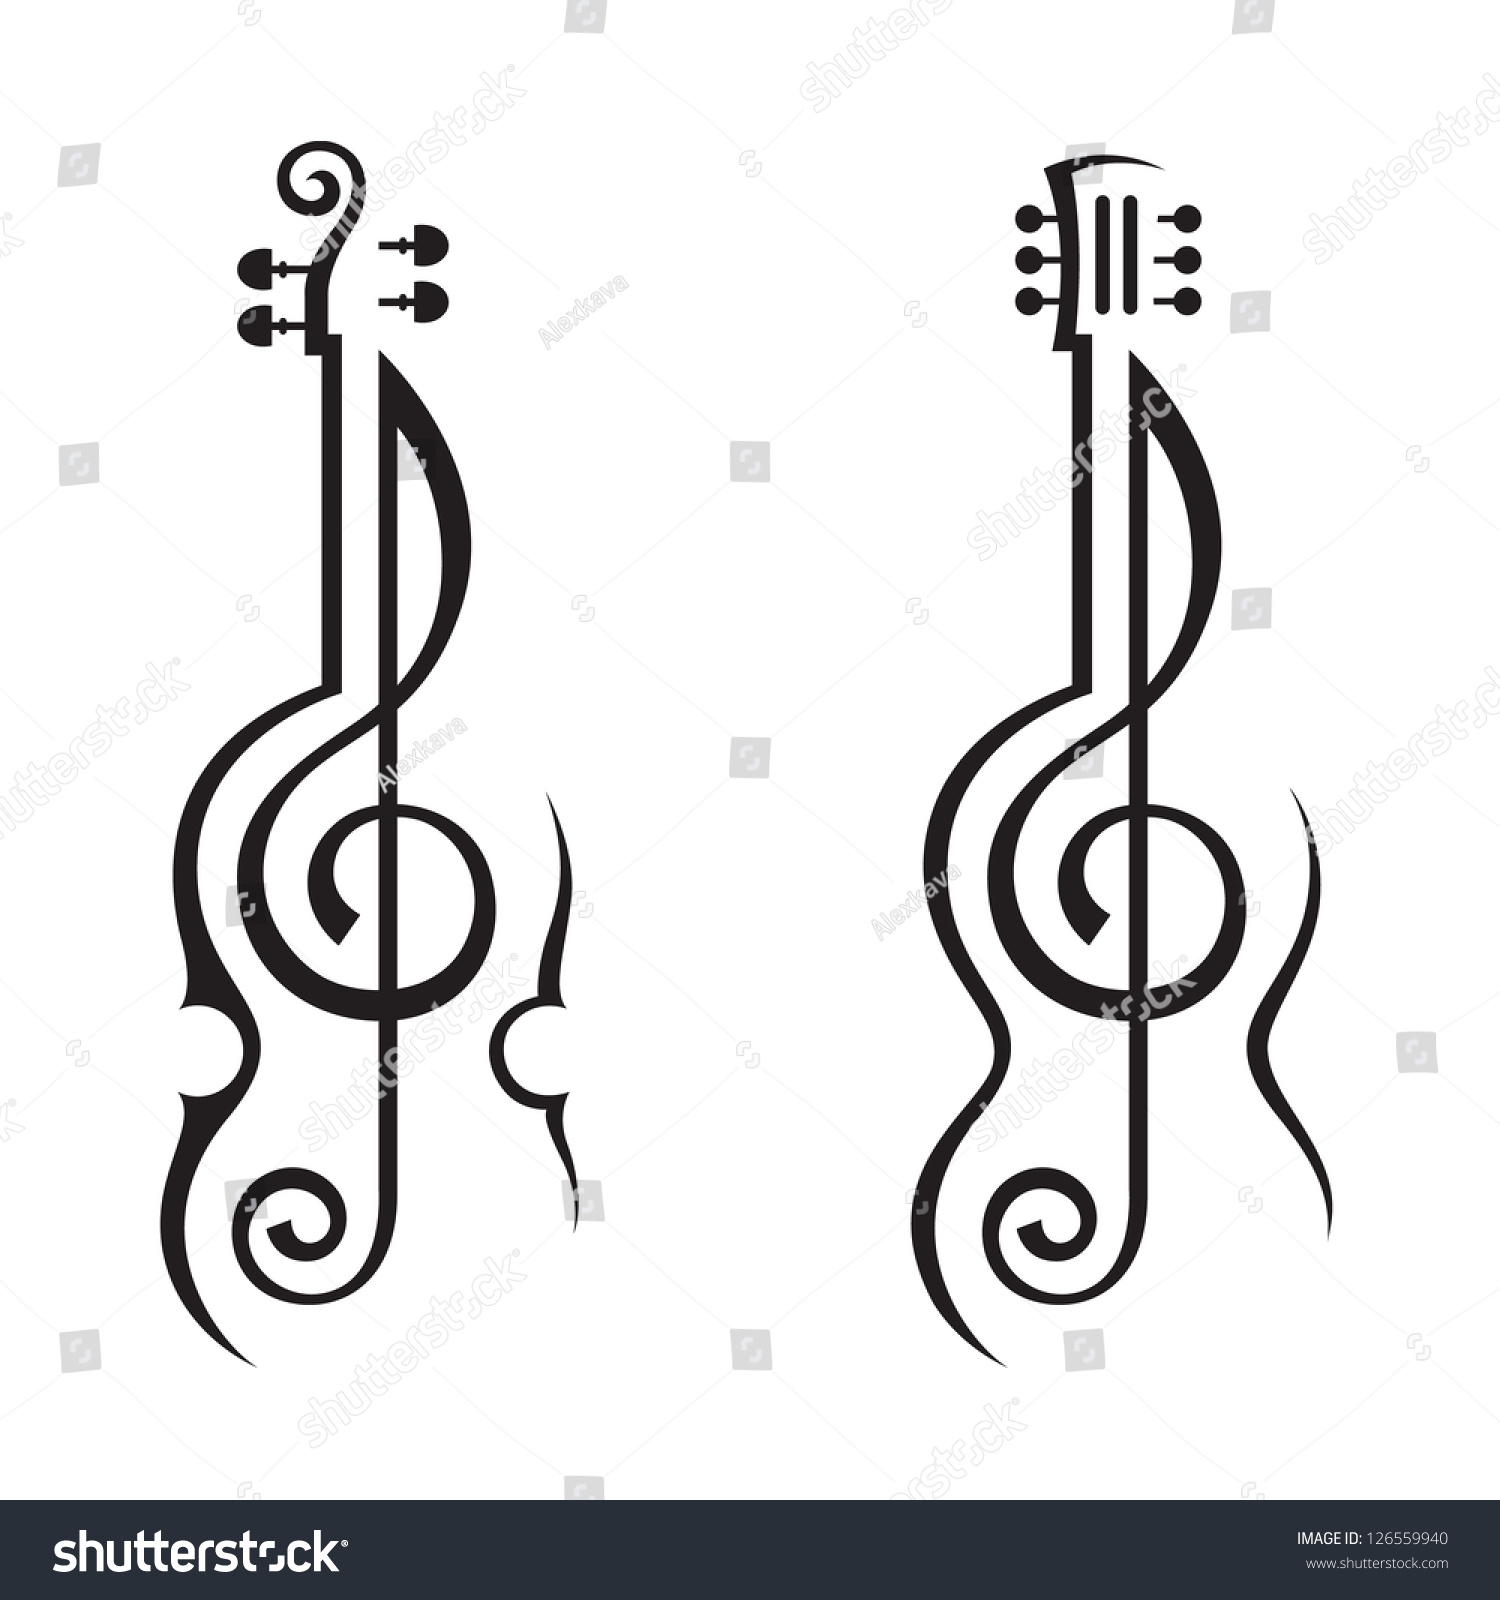 Violin Guitar Treble Clef Stock Vector 126559940 - Shutterstock